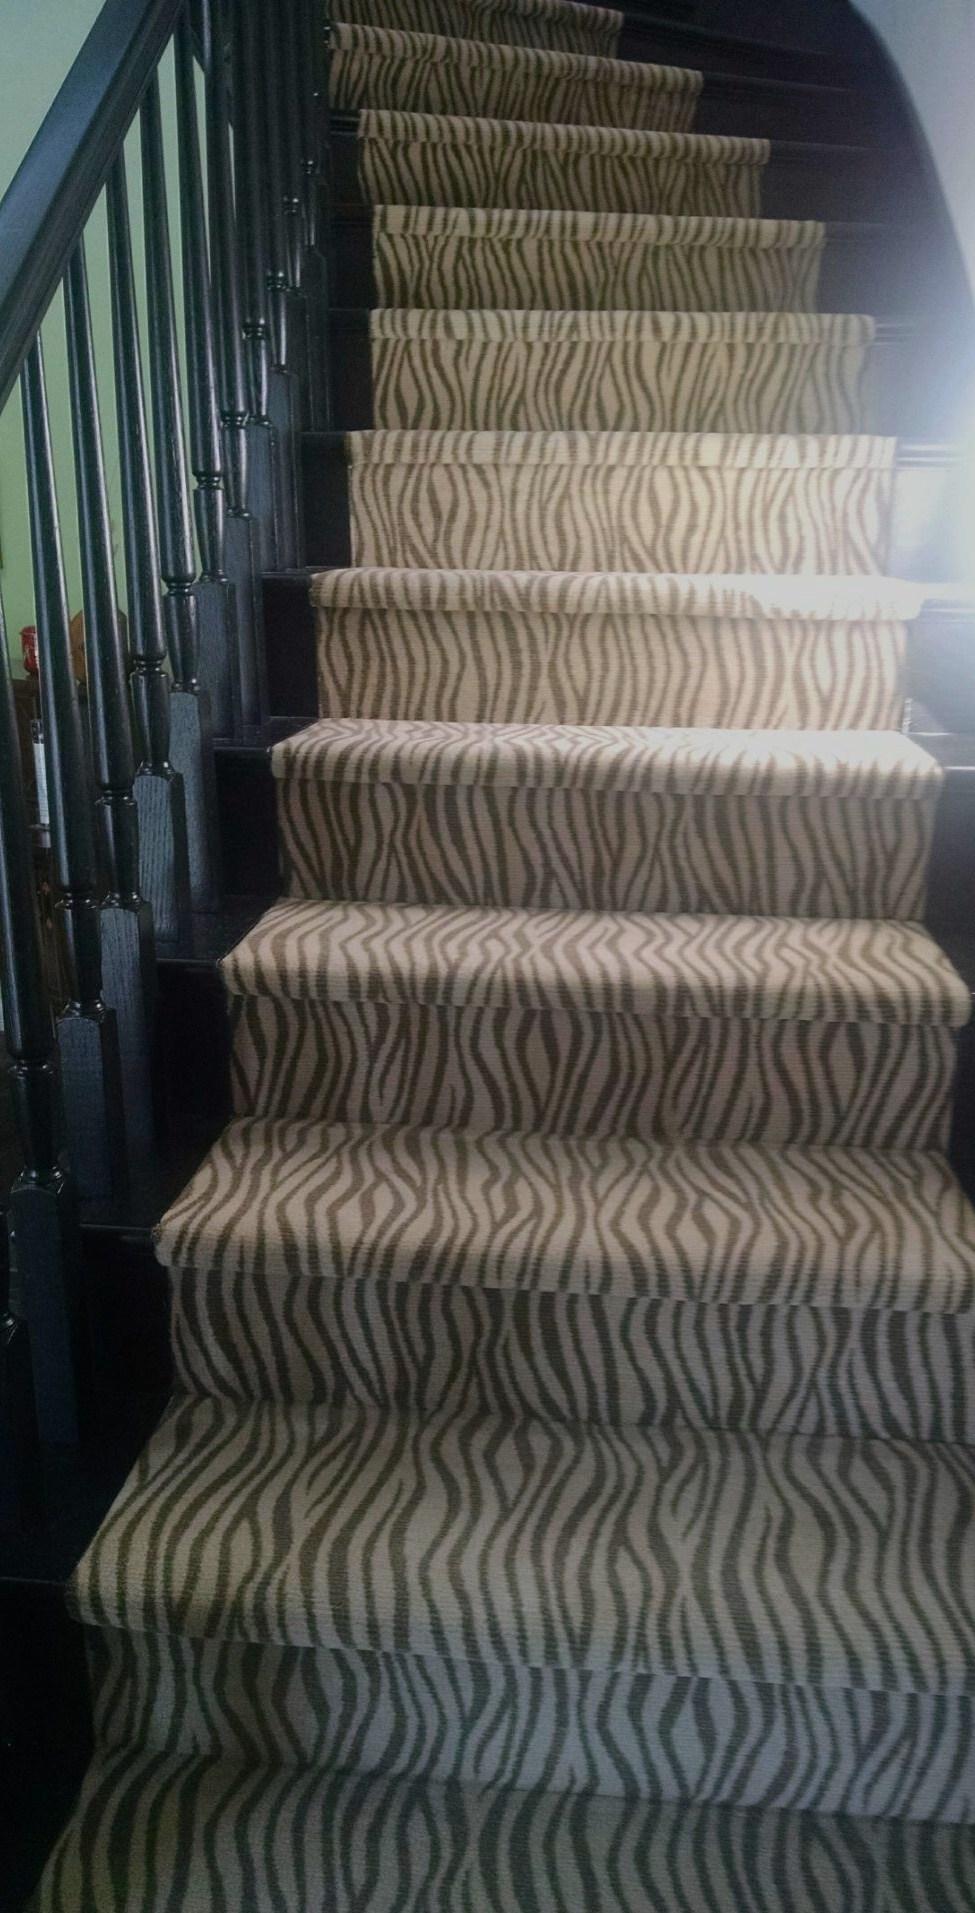 Zebra Print Stair Runner Hemphill S Rugs Carpets Portfolio | Printed Carpet For Stairs | High Traffic | Gray | Karastan Patterned | Georgian | Middle Open Concept